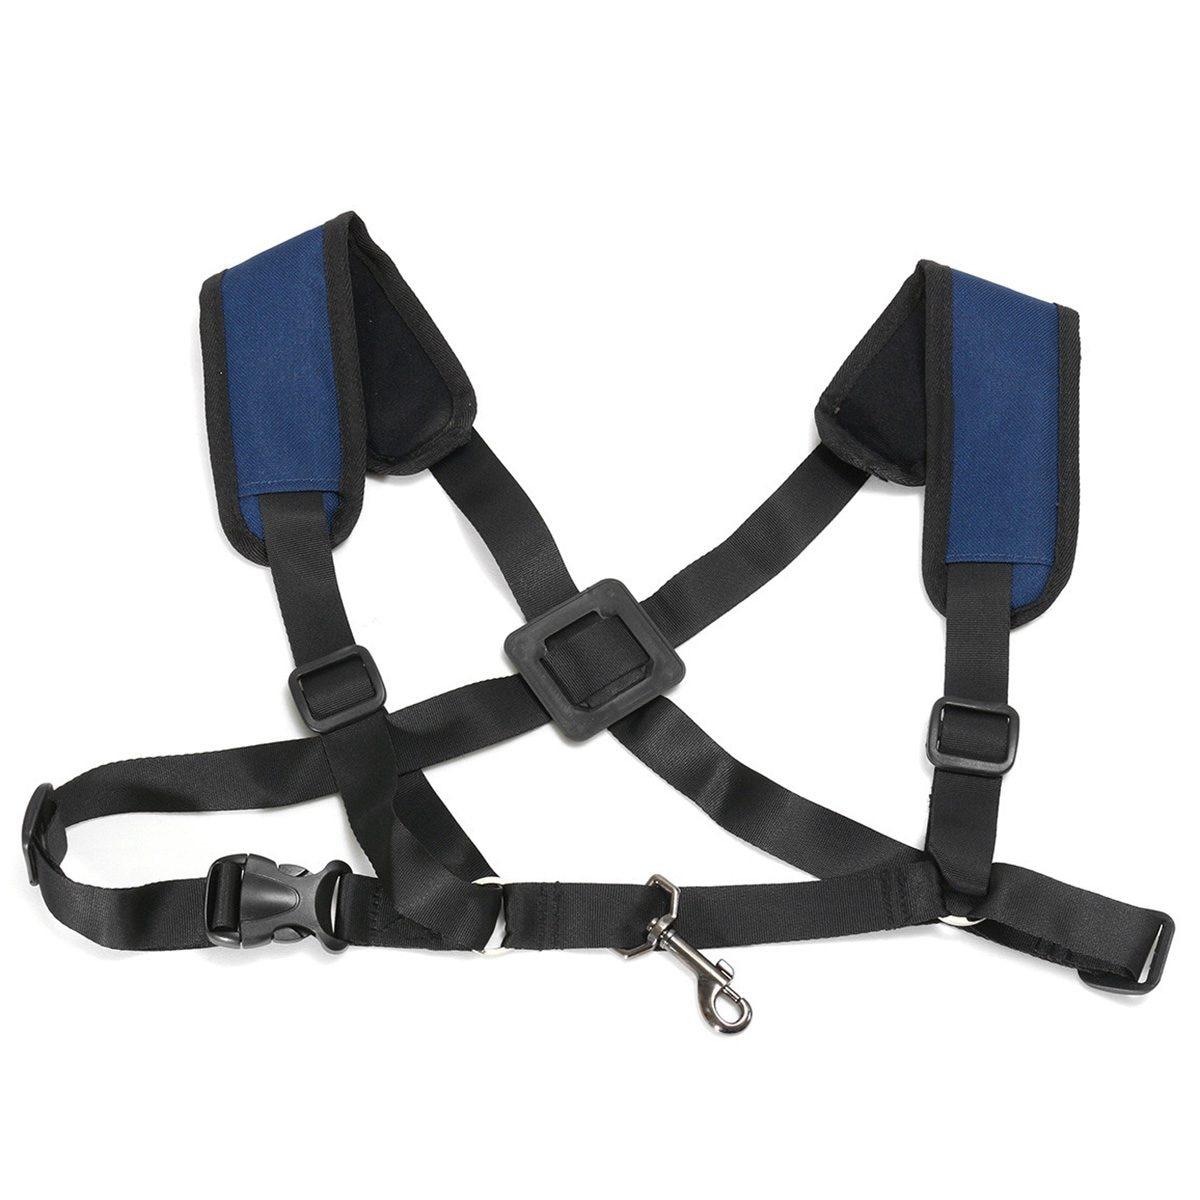 SEWS-Adjustable Soft Sax Harness Shoulder Pad Strap Saxophone For Alto